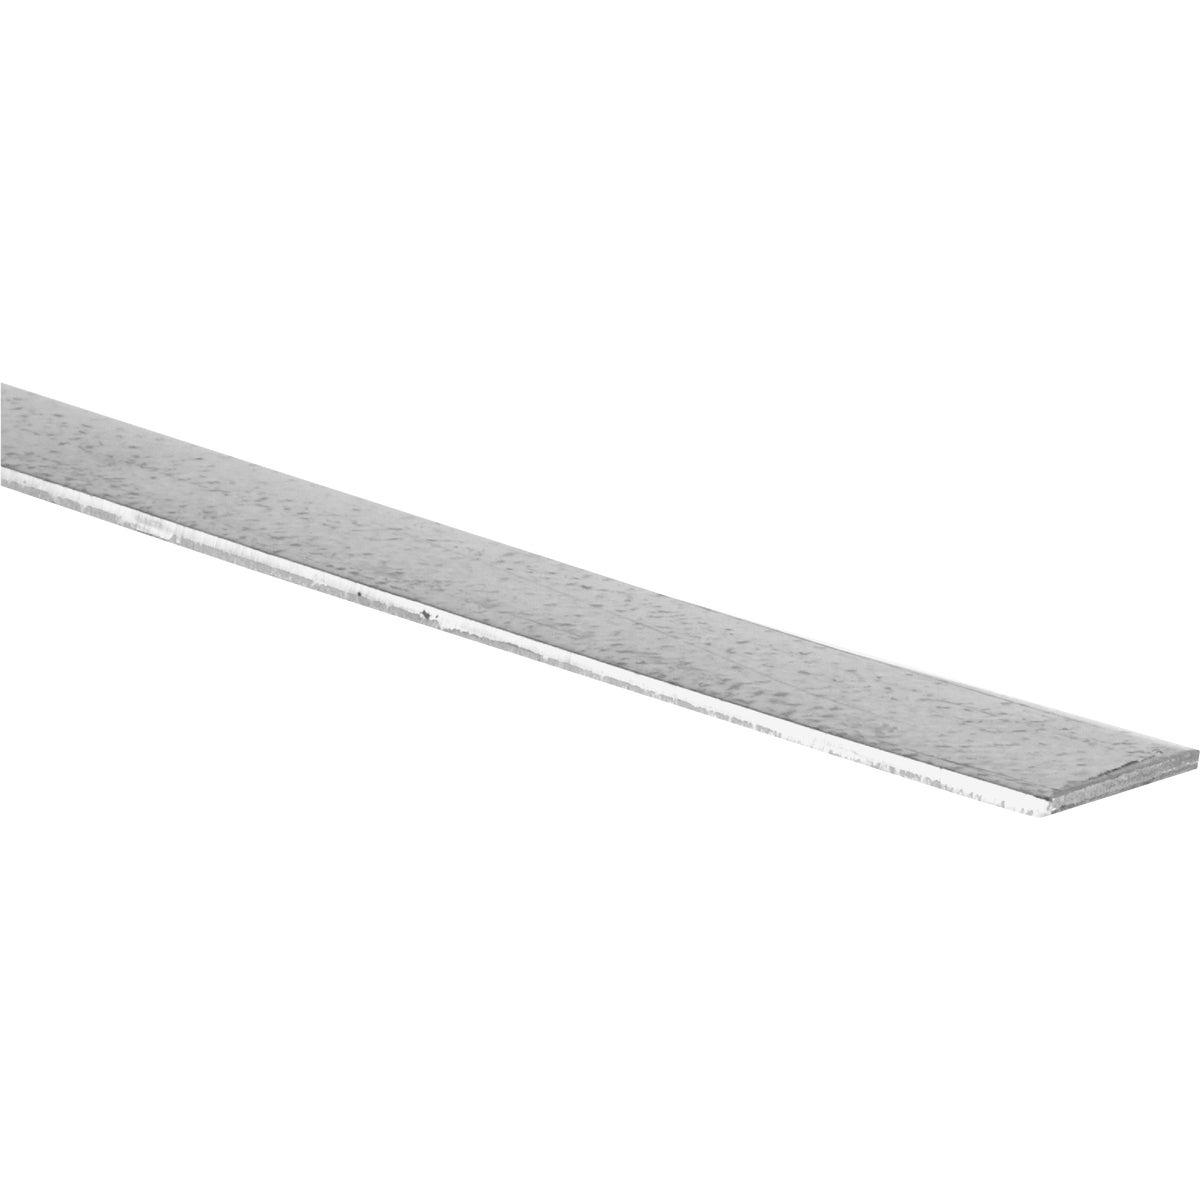 1X3' ZP STEEL FLAT BAR